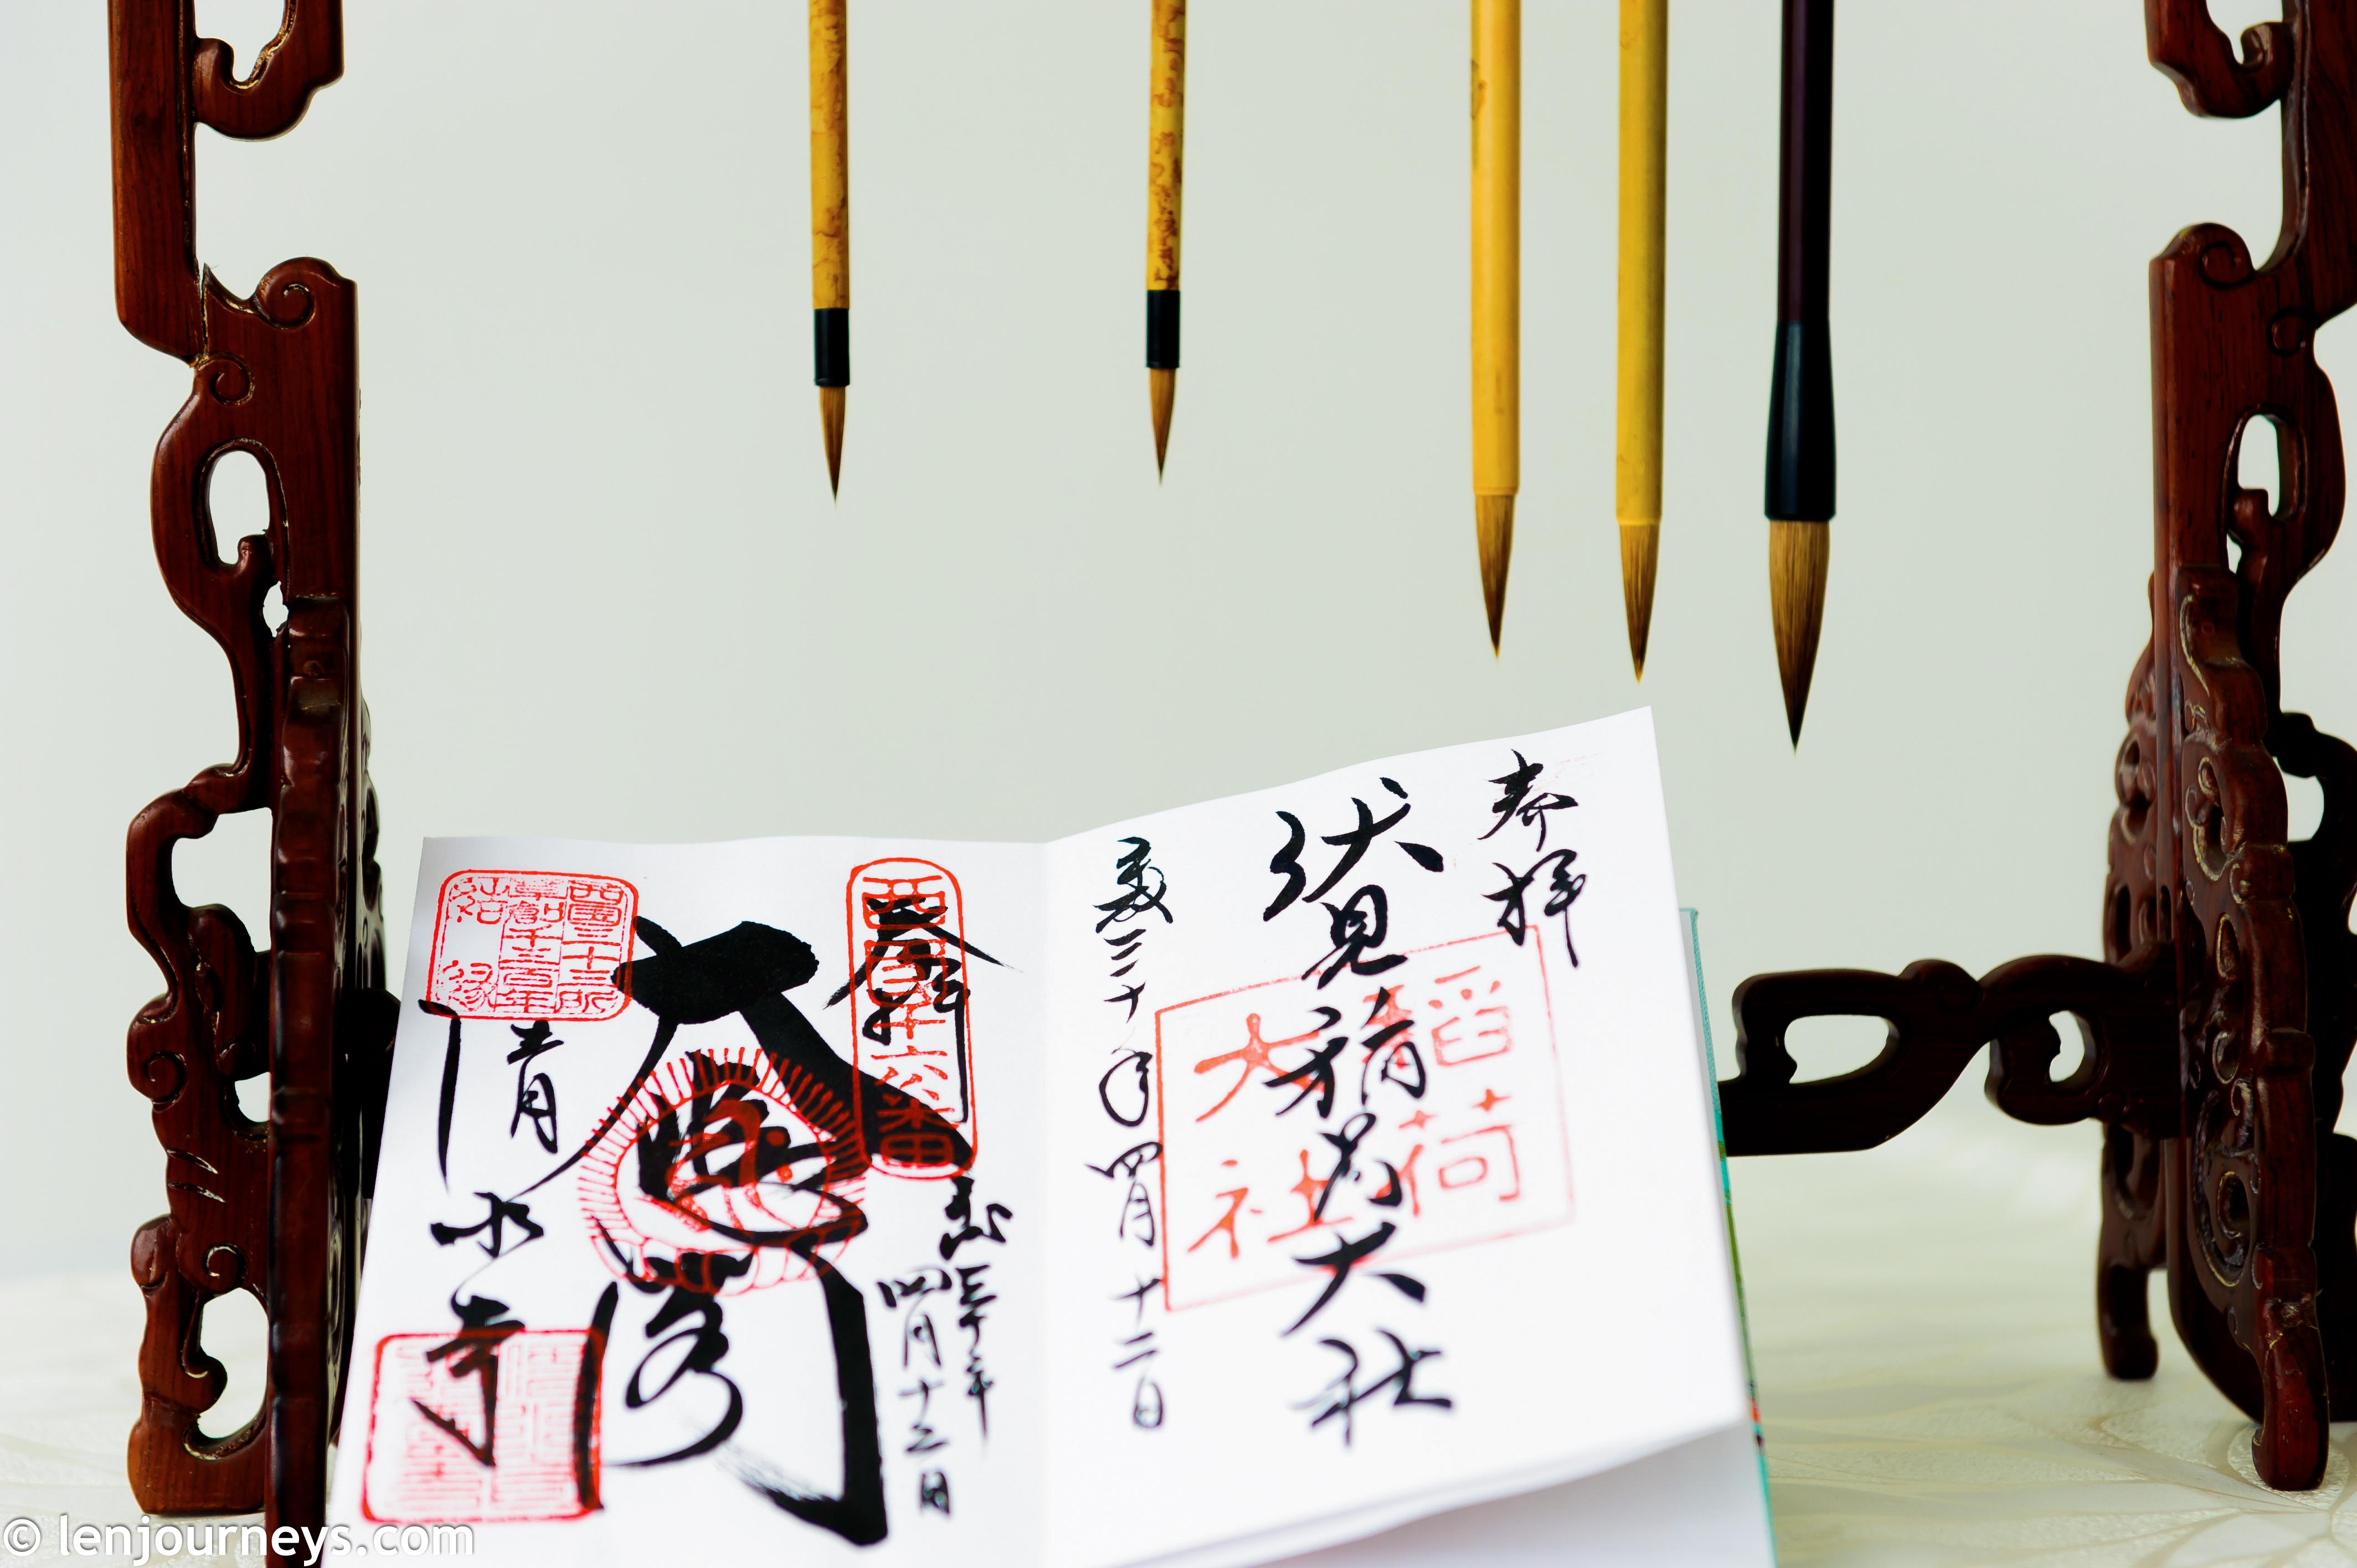 Goshuinchō - The book of seals